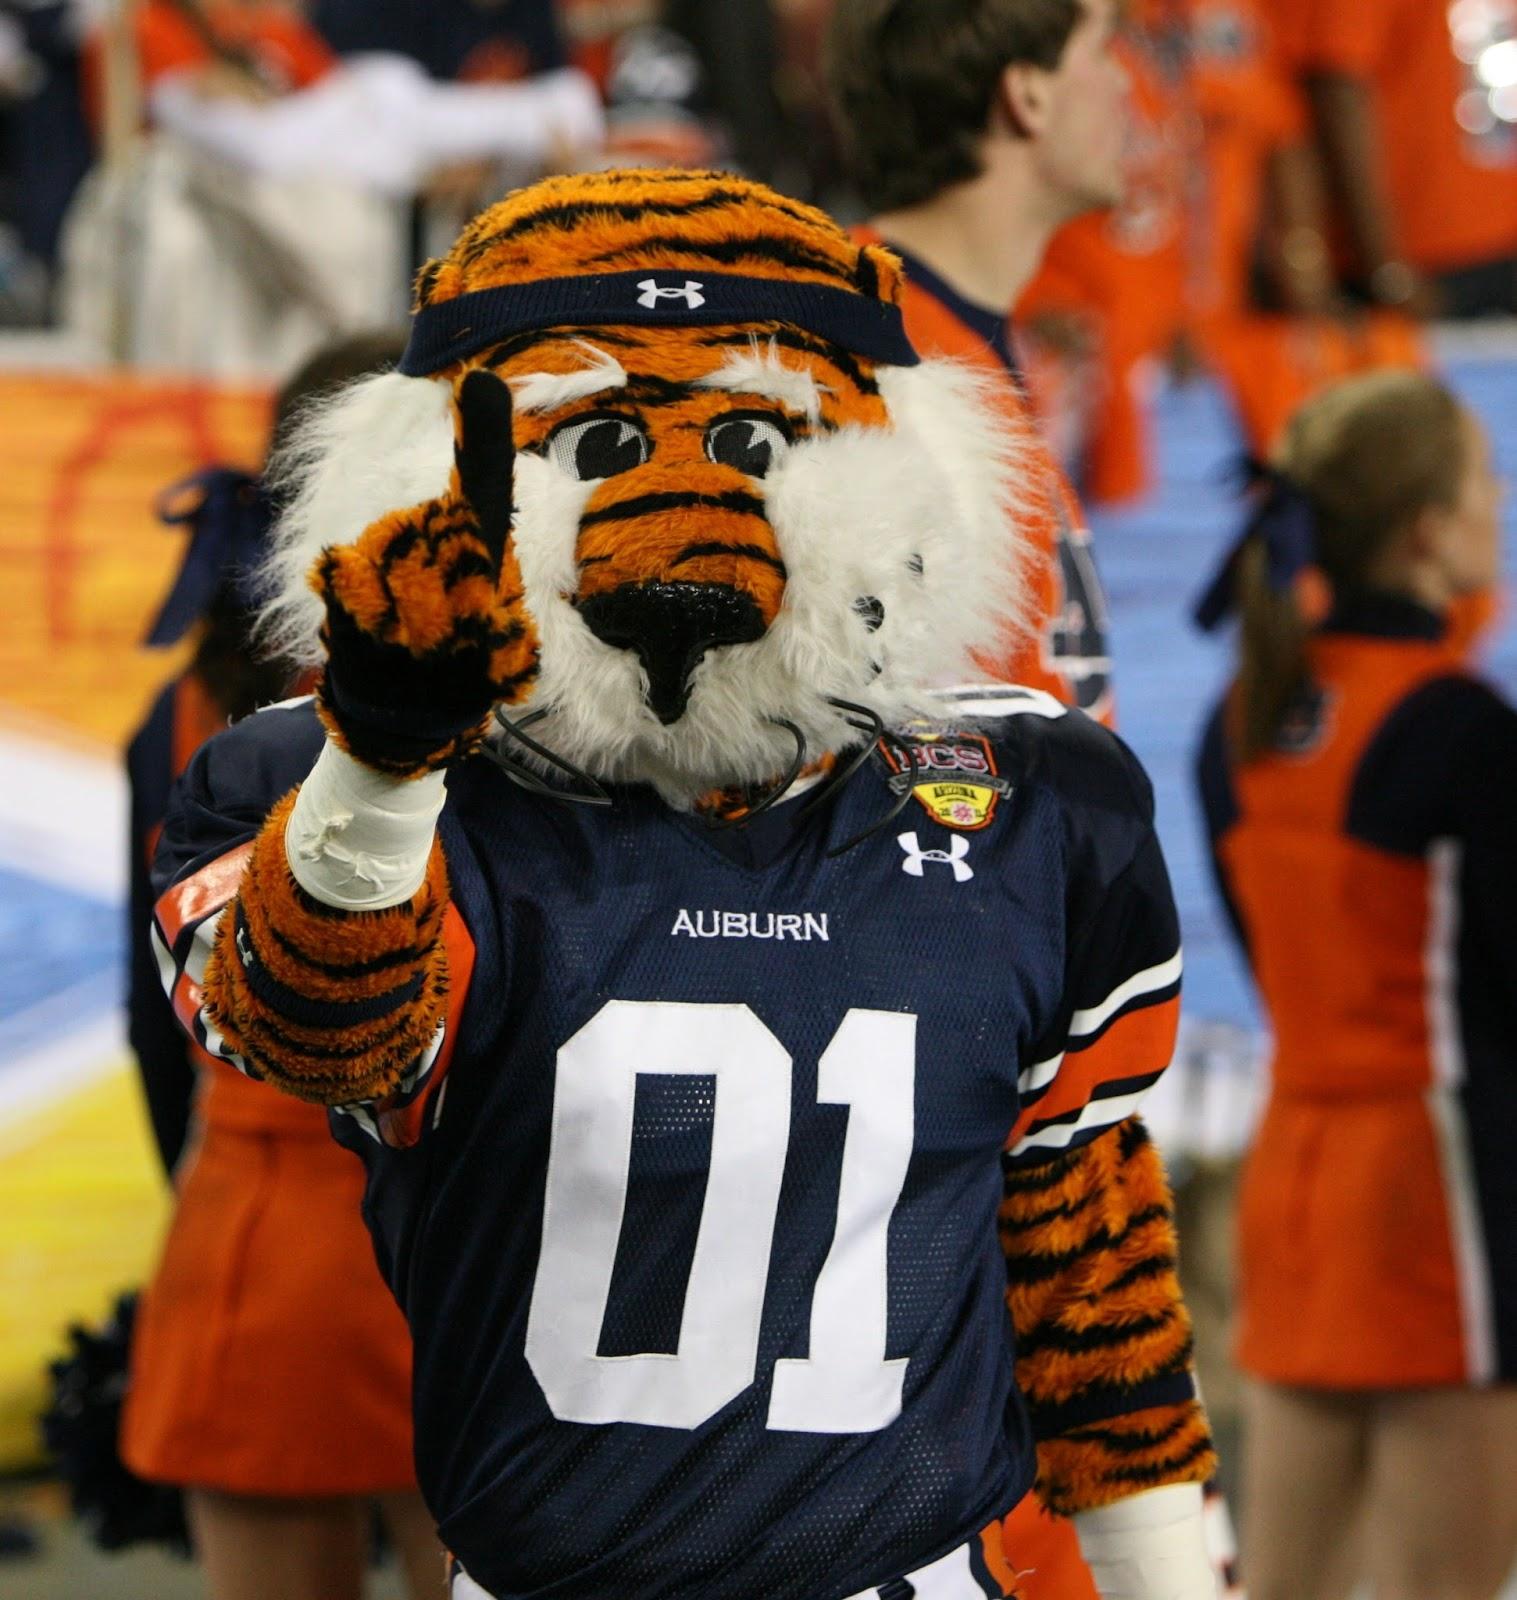 Auburn-Opelika: Weekend Events for Auburn Football!